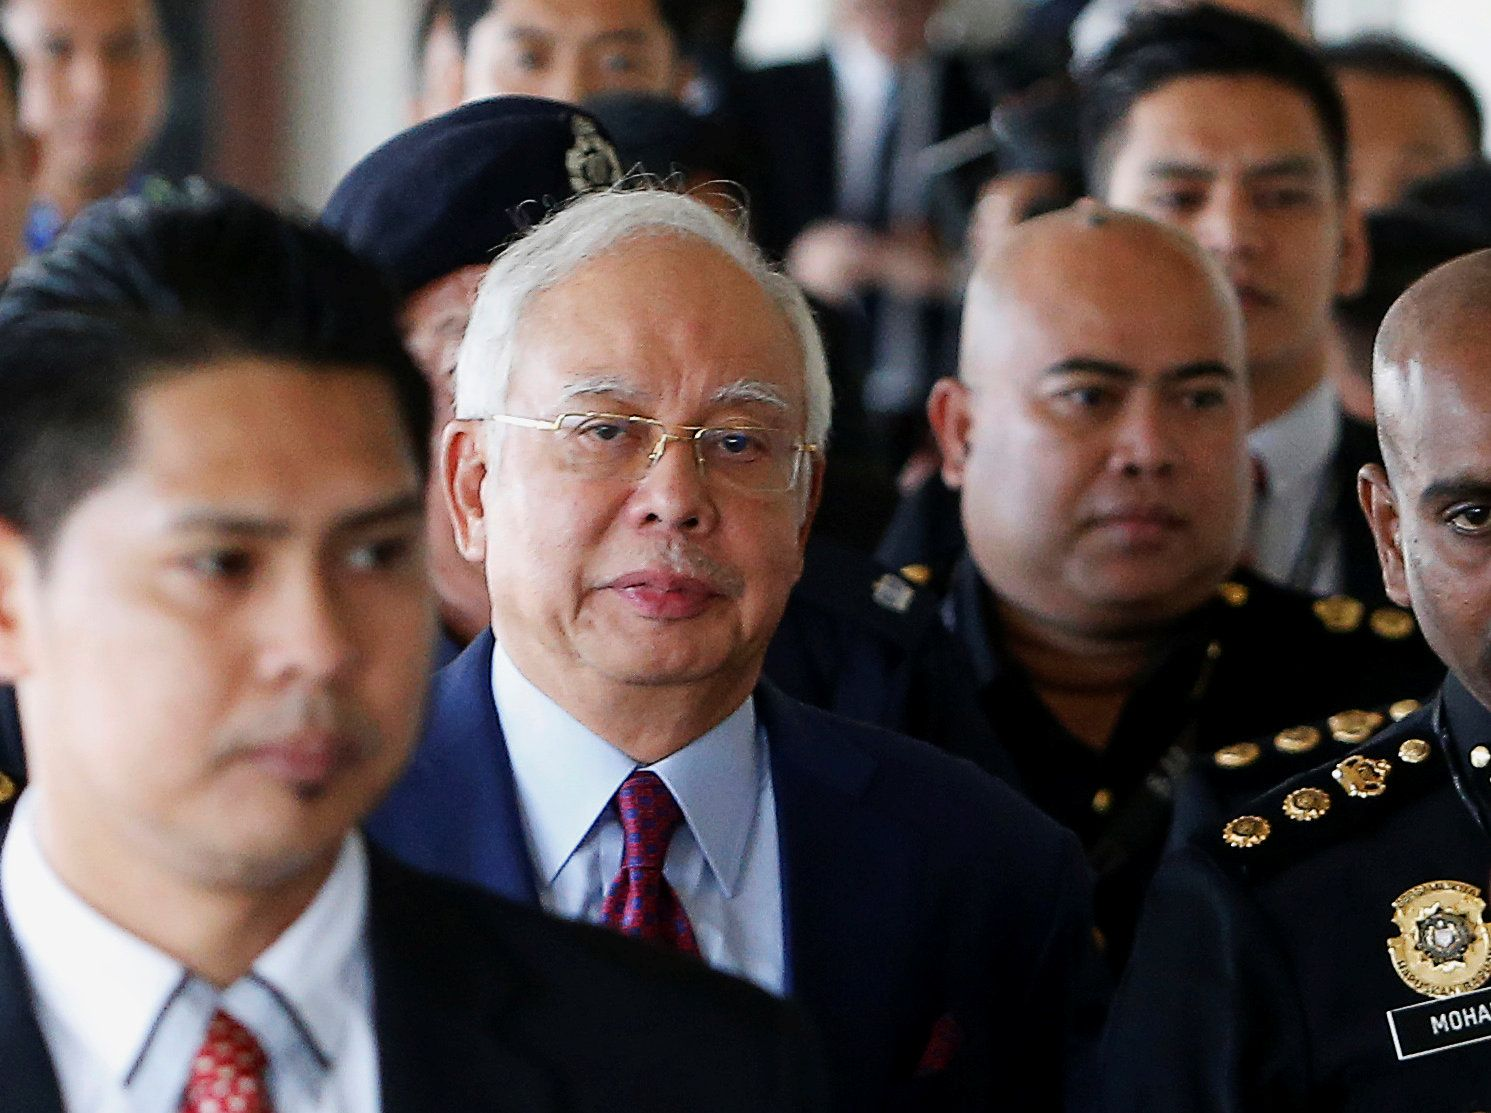 MALAYSIA-POLITICS/NAJIB